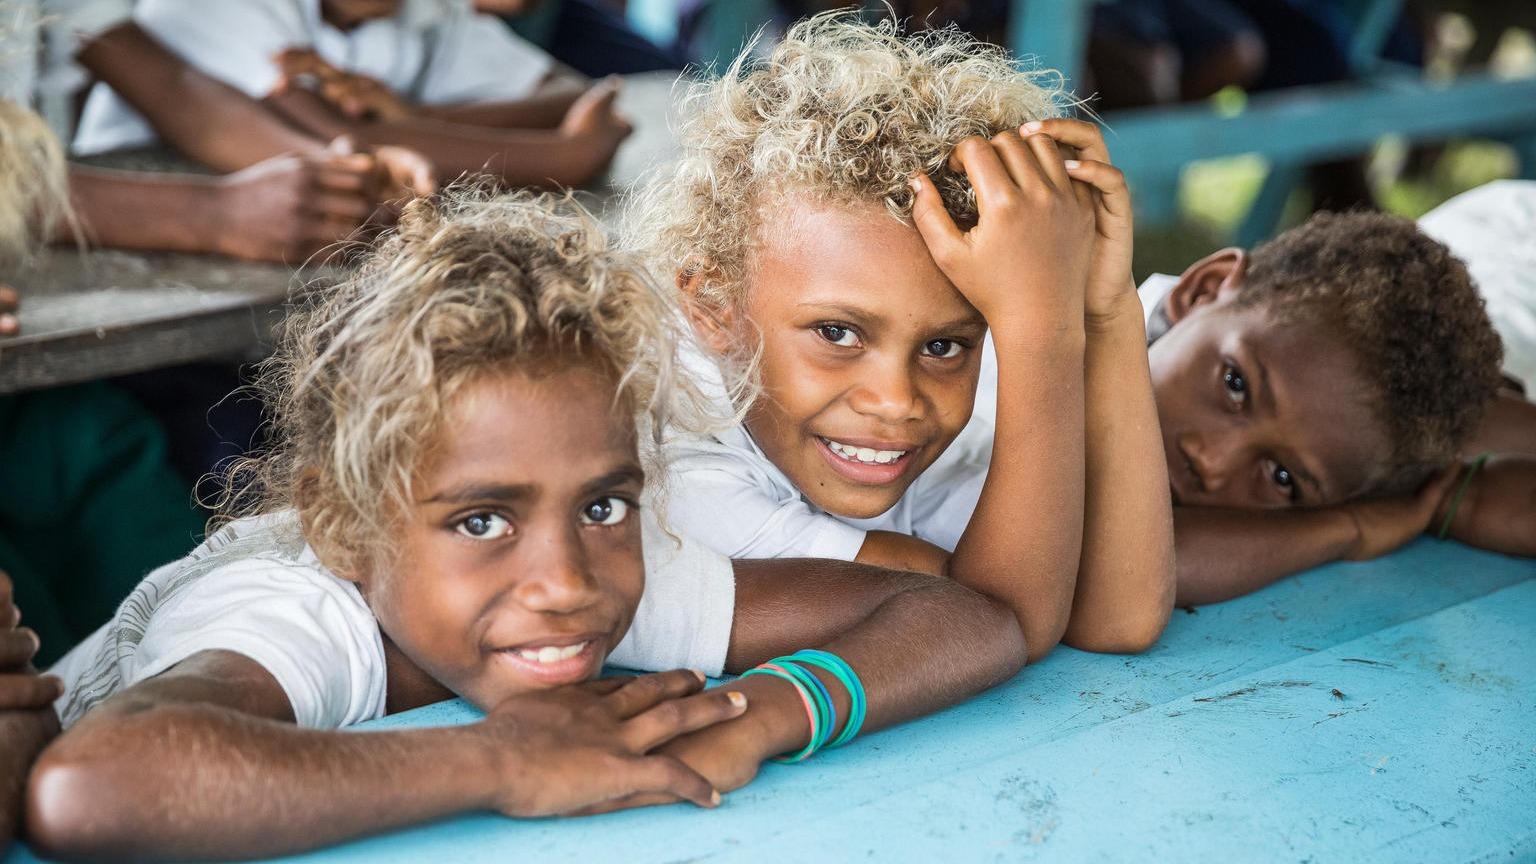 Solomon Islands | ©UNICEF/UN0205853